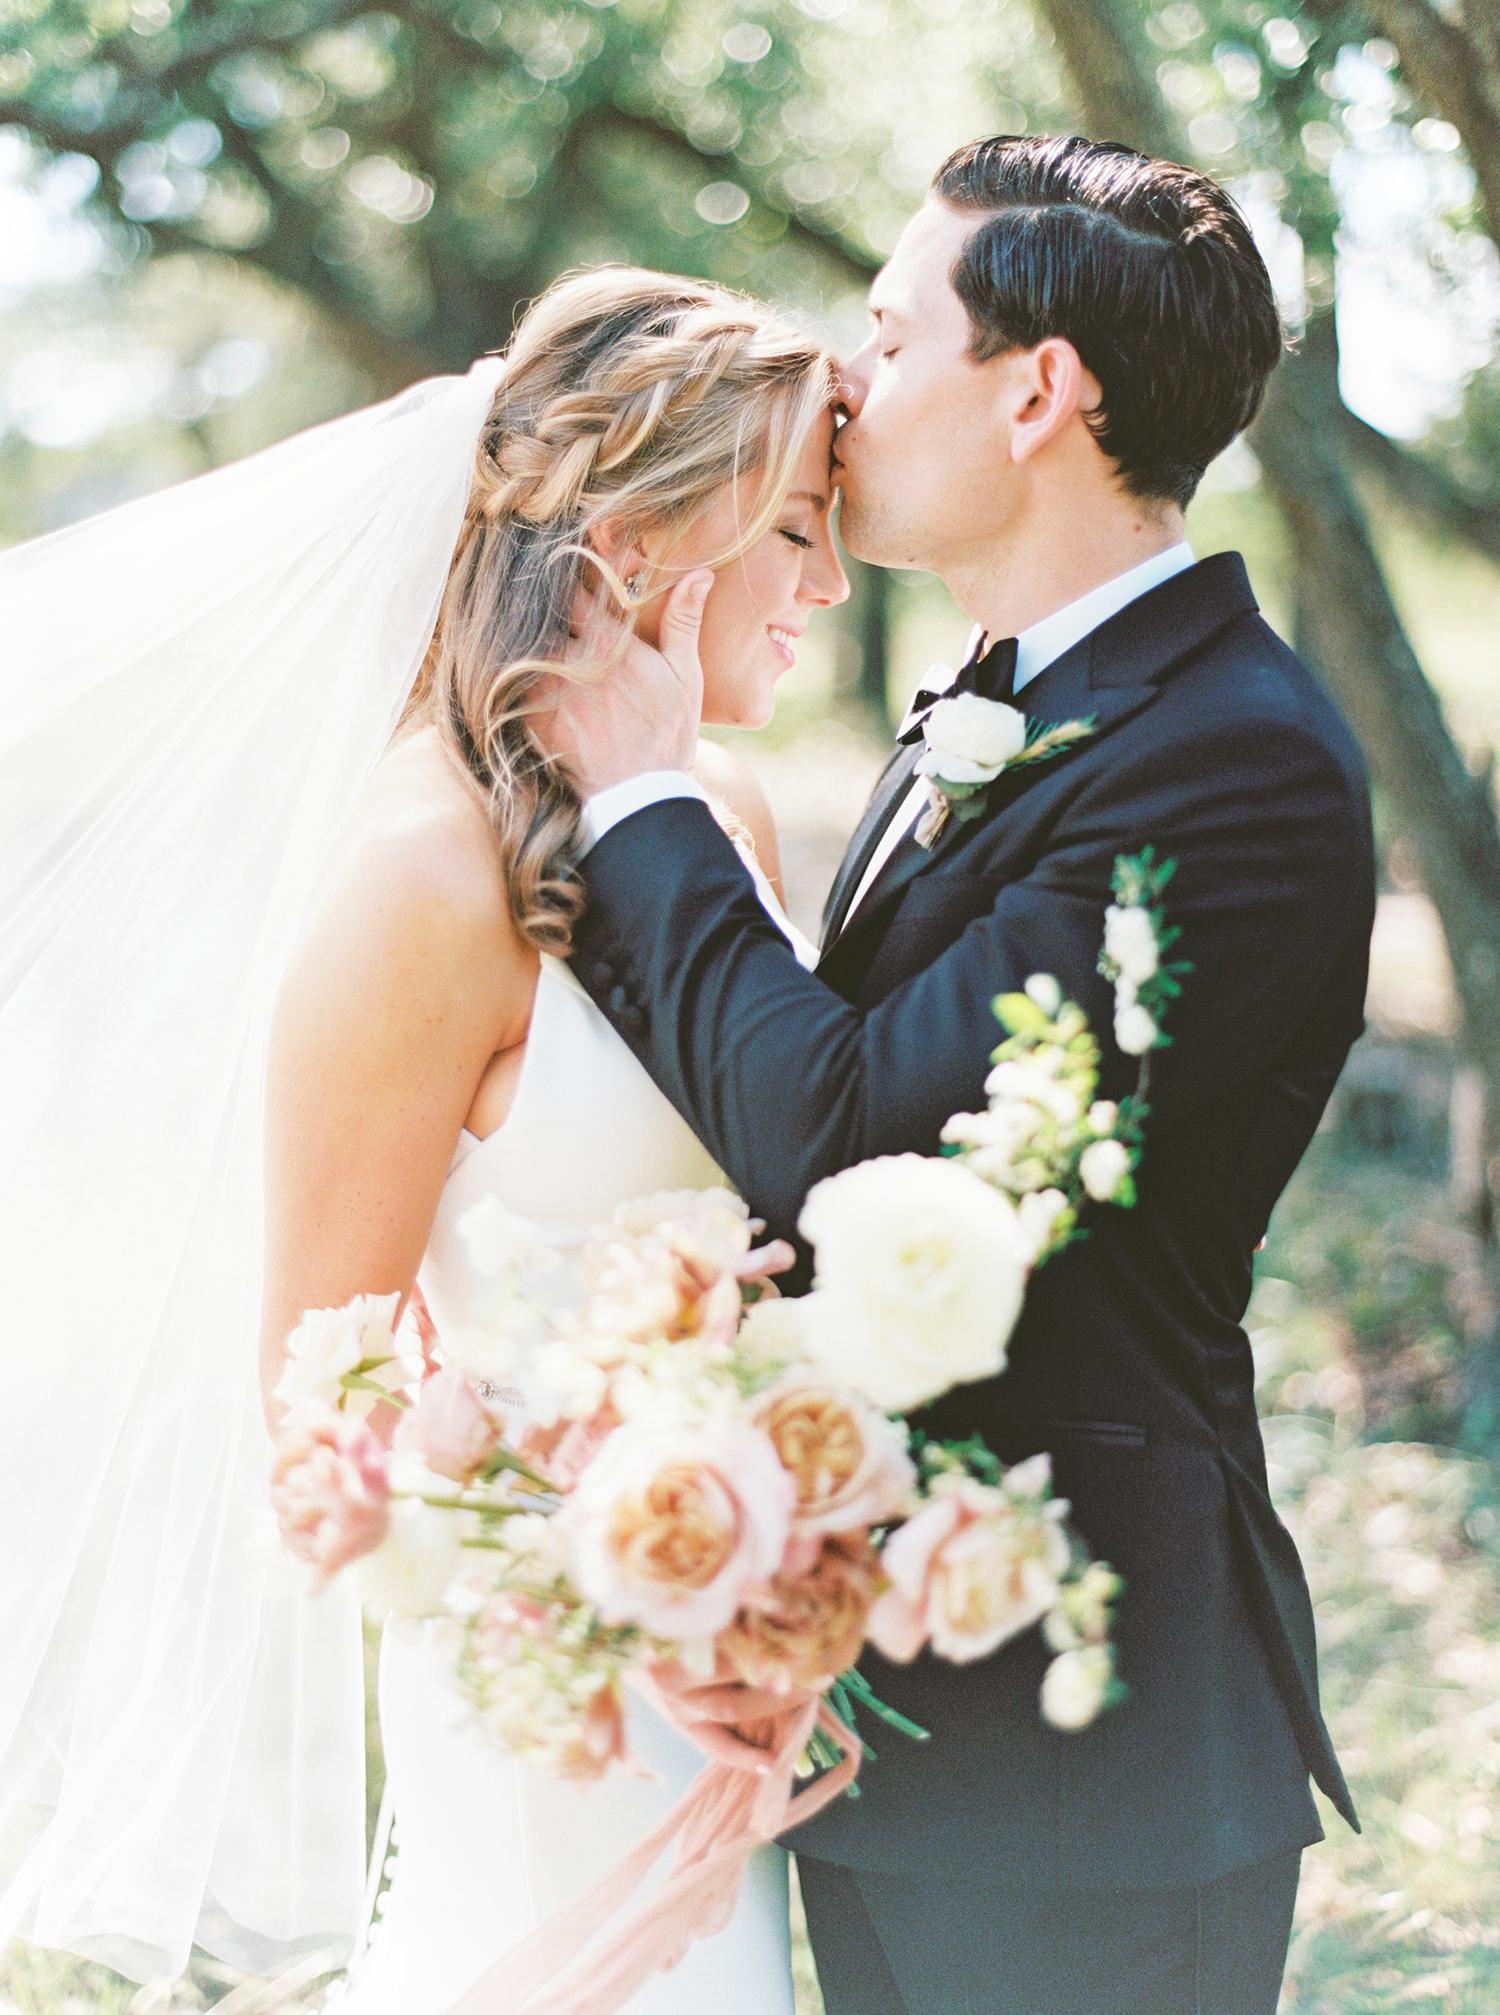 amanda chuck wedding couple forehead kiss under the trees